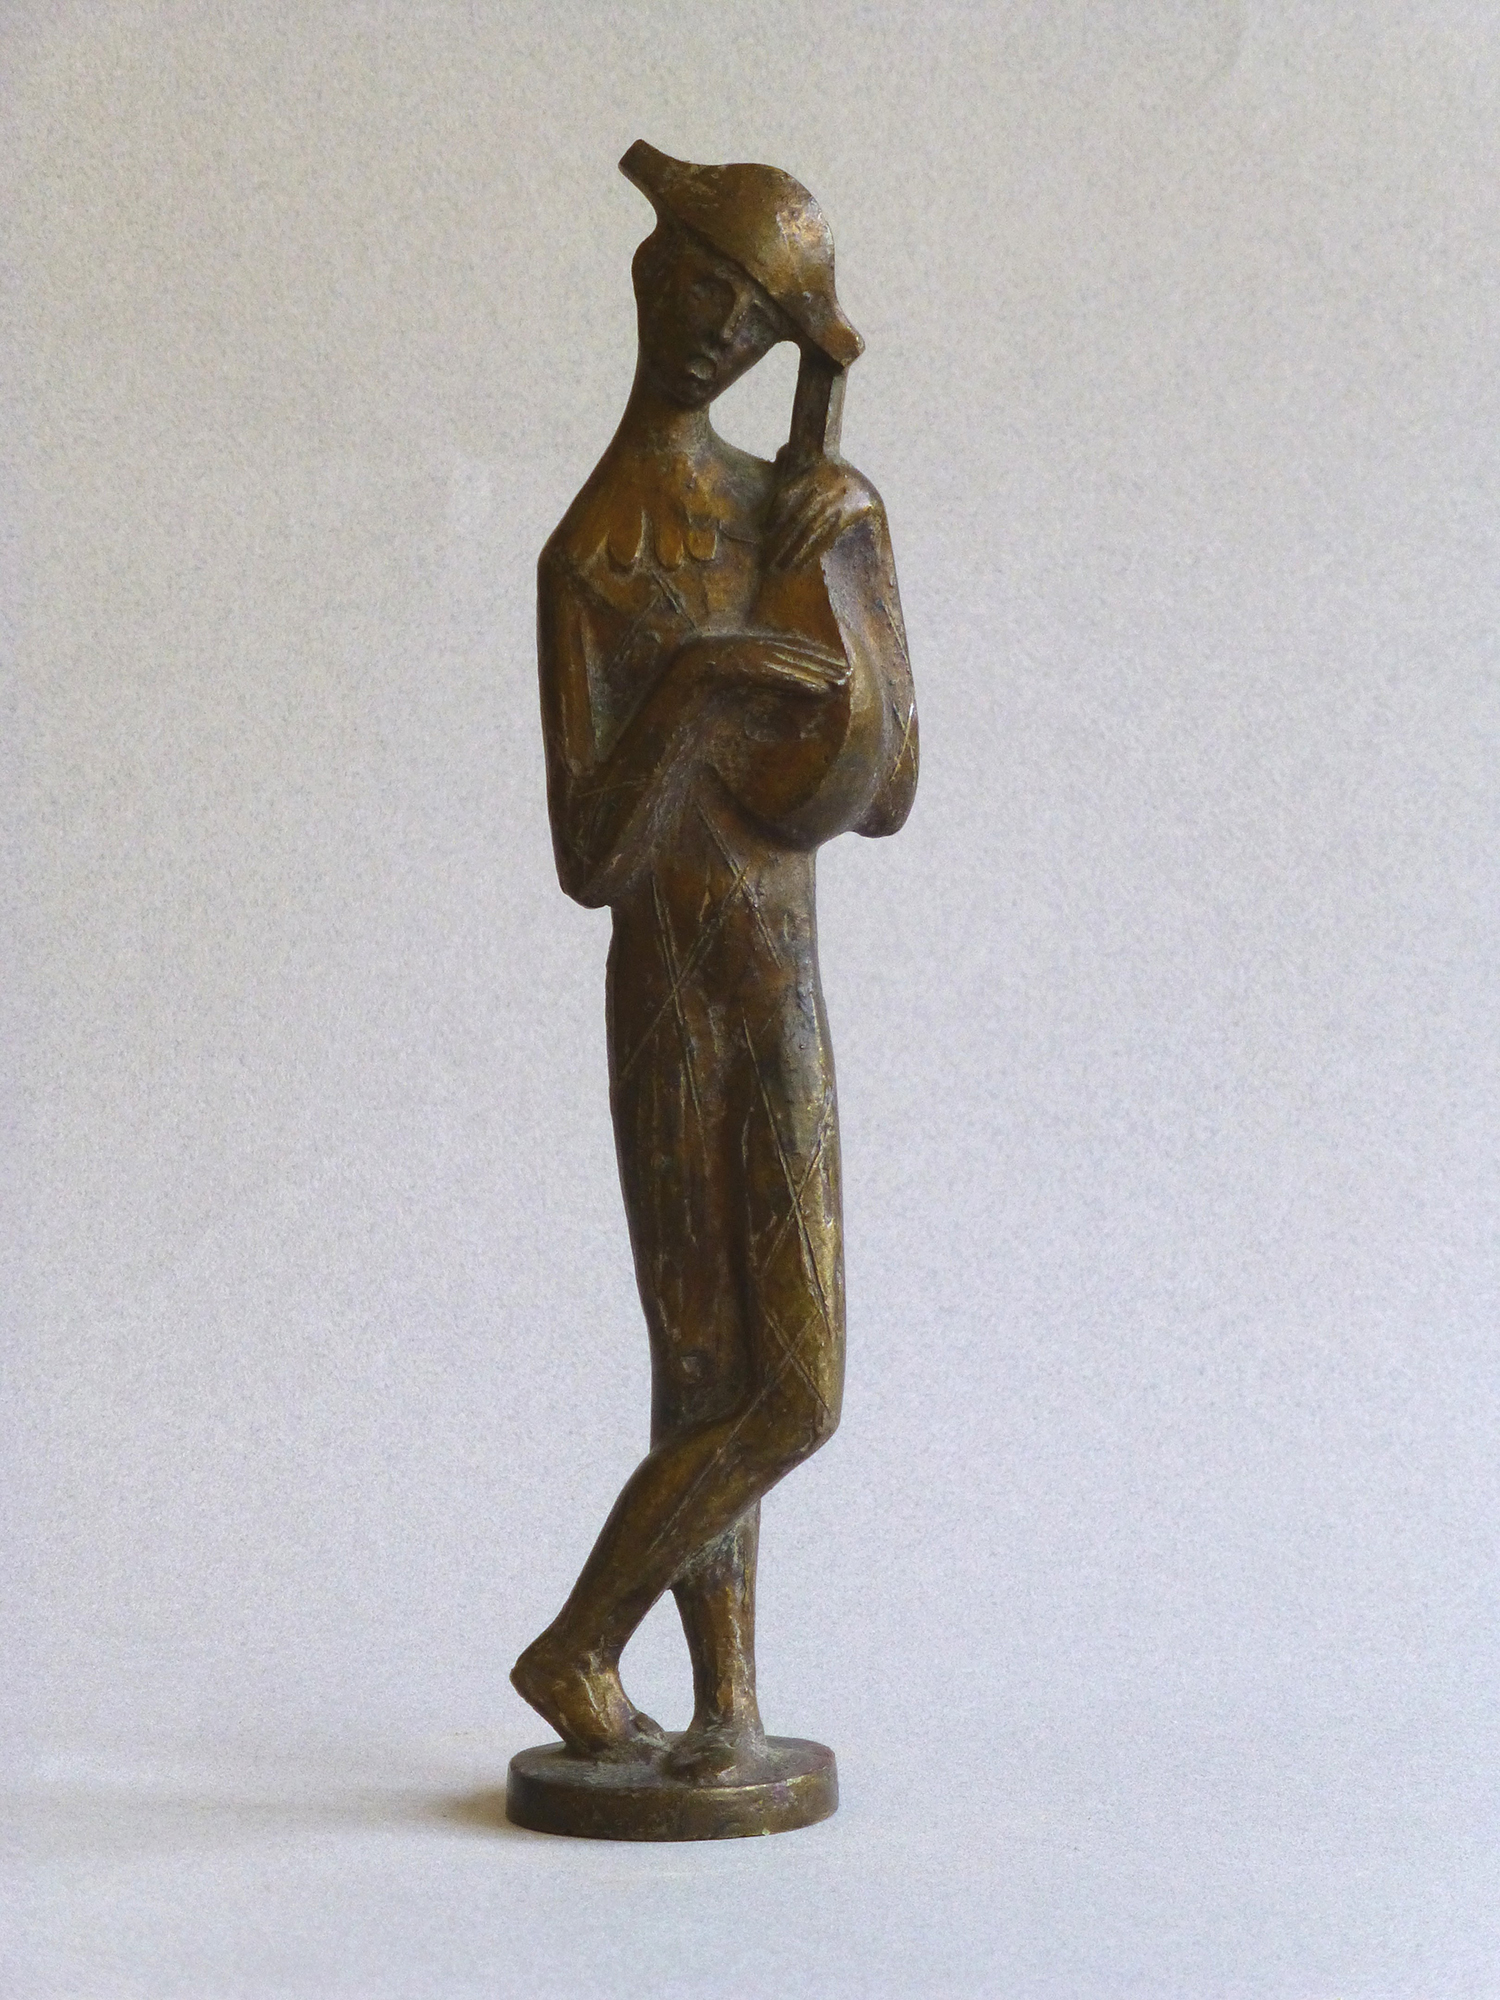 1965. Arlequín, trofeo, bronce, 23x5x3 cms. Premios Imperator de Oro. Sala de Fiestas Imperator, Madrid. 1965